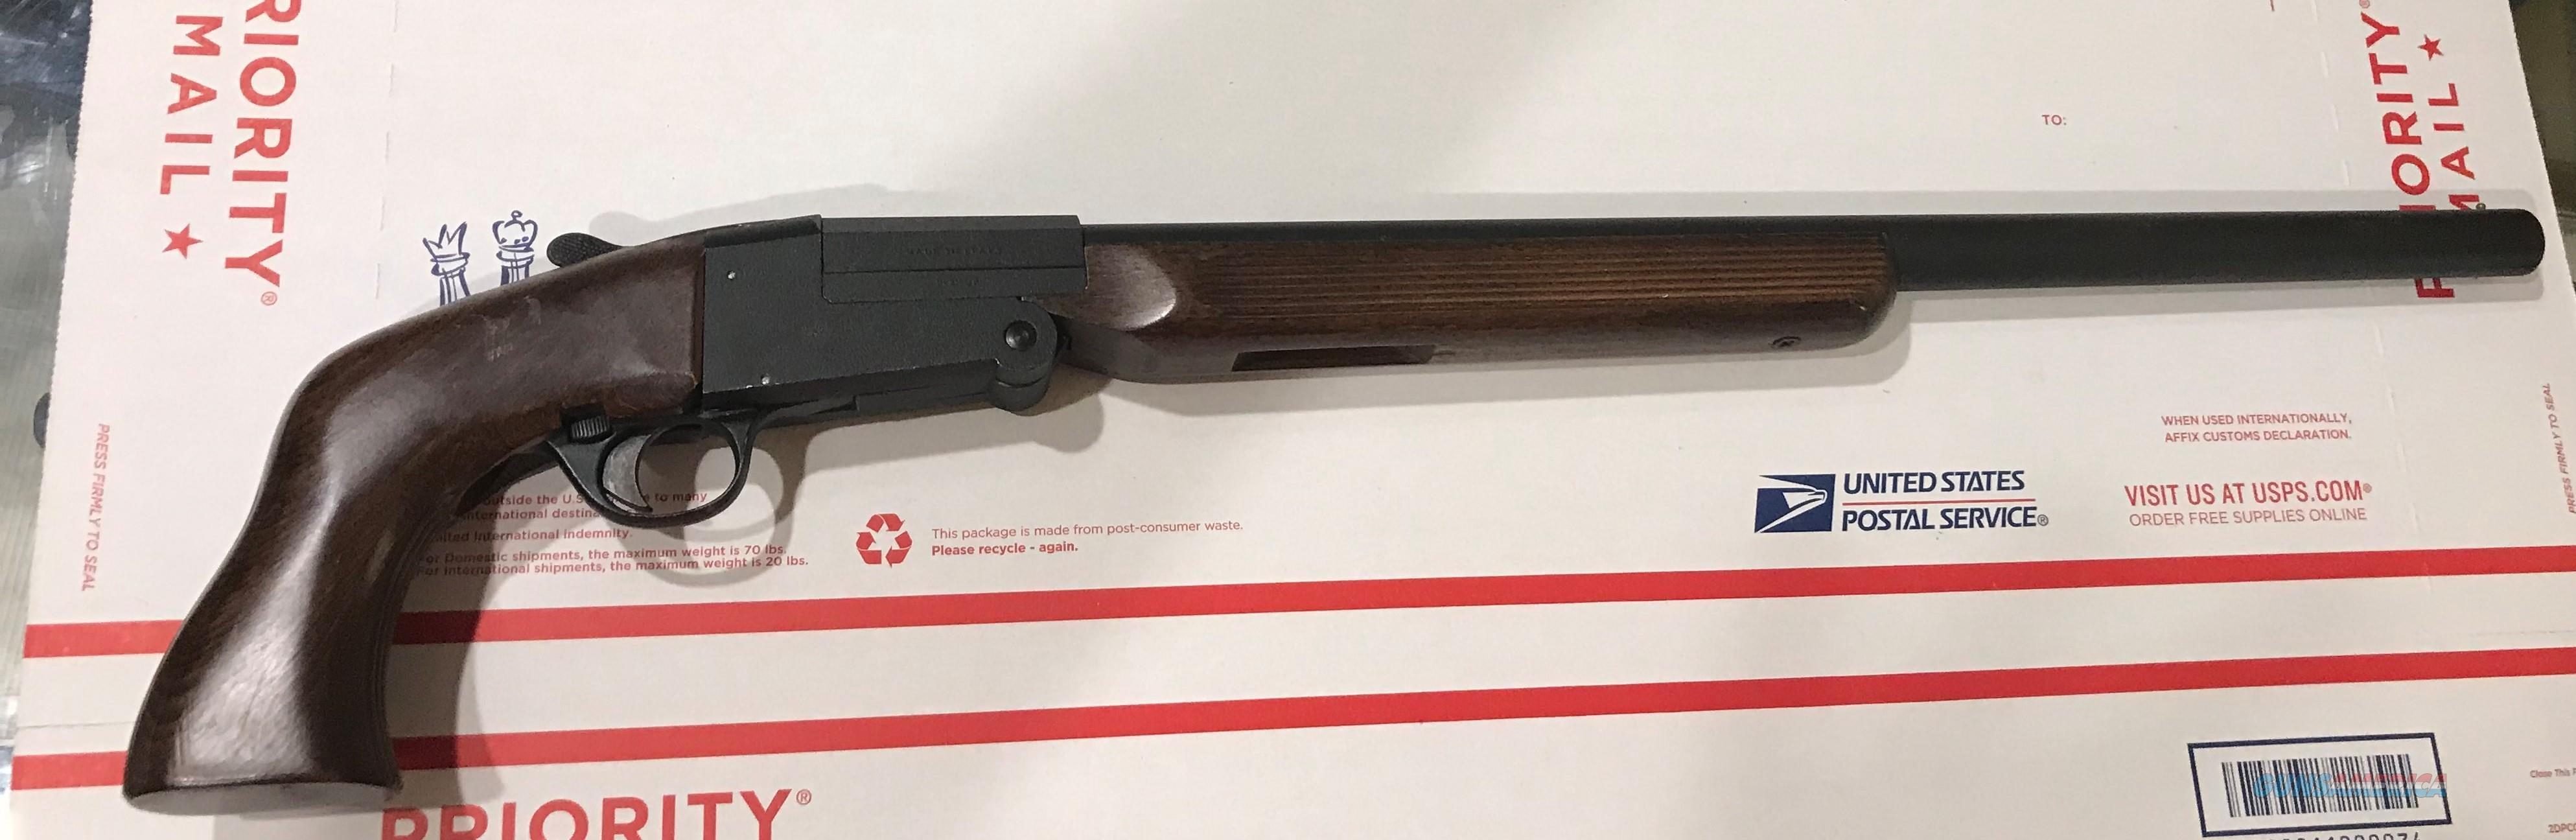 American Arms single shot 12 gauge shotgun very good condition  (No card fees added)  Guns > Shotguns > American Arms Shotguns